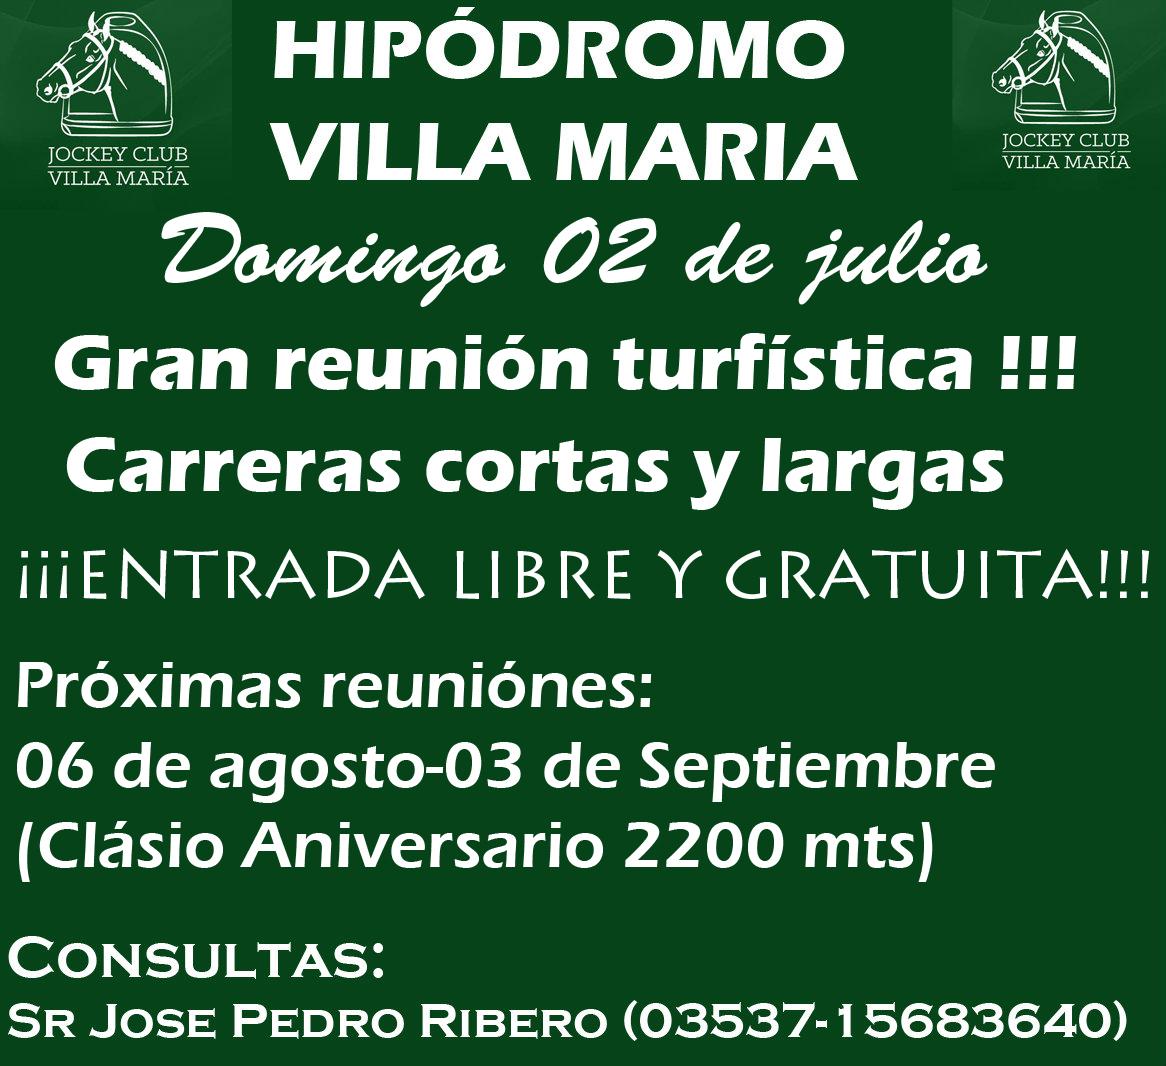 HIPODROMO VILLA MARIA